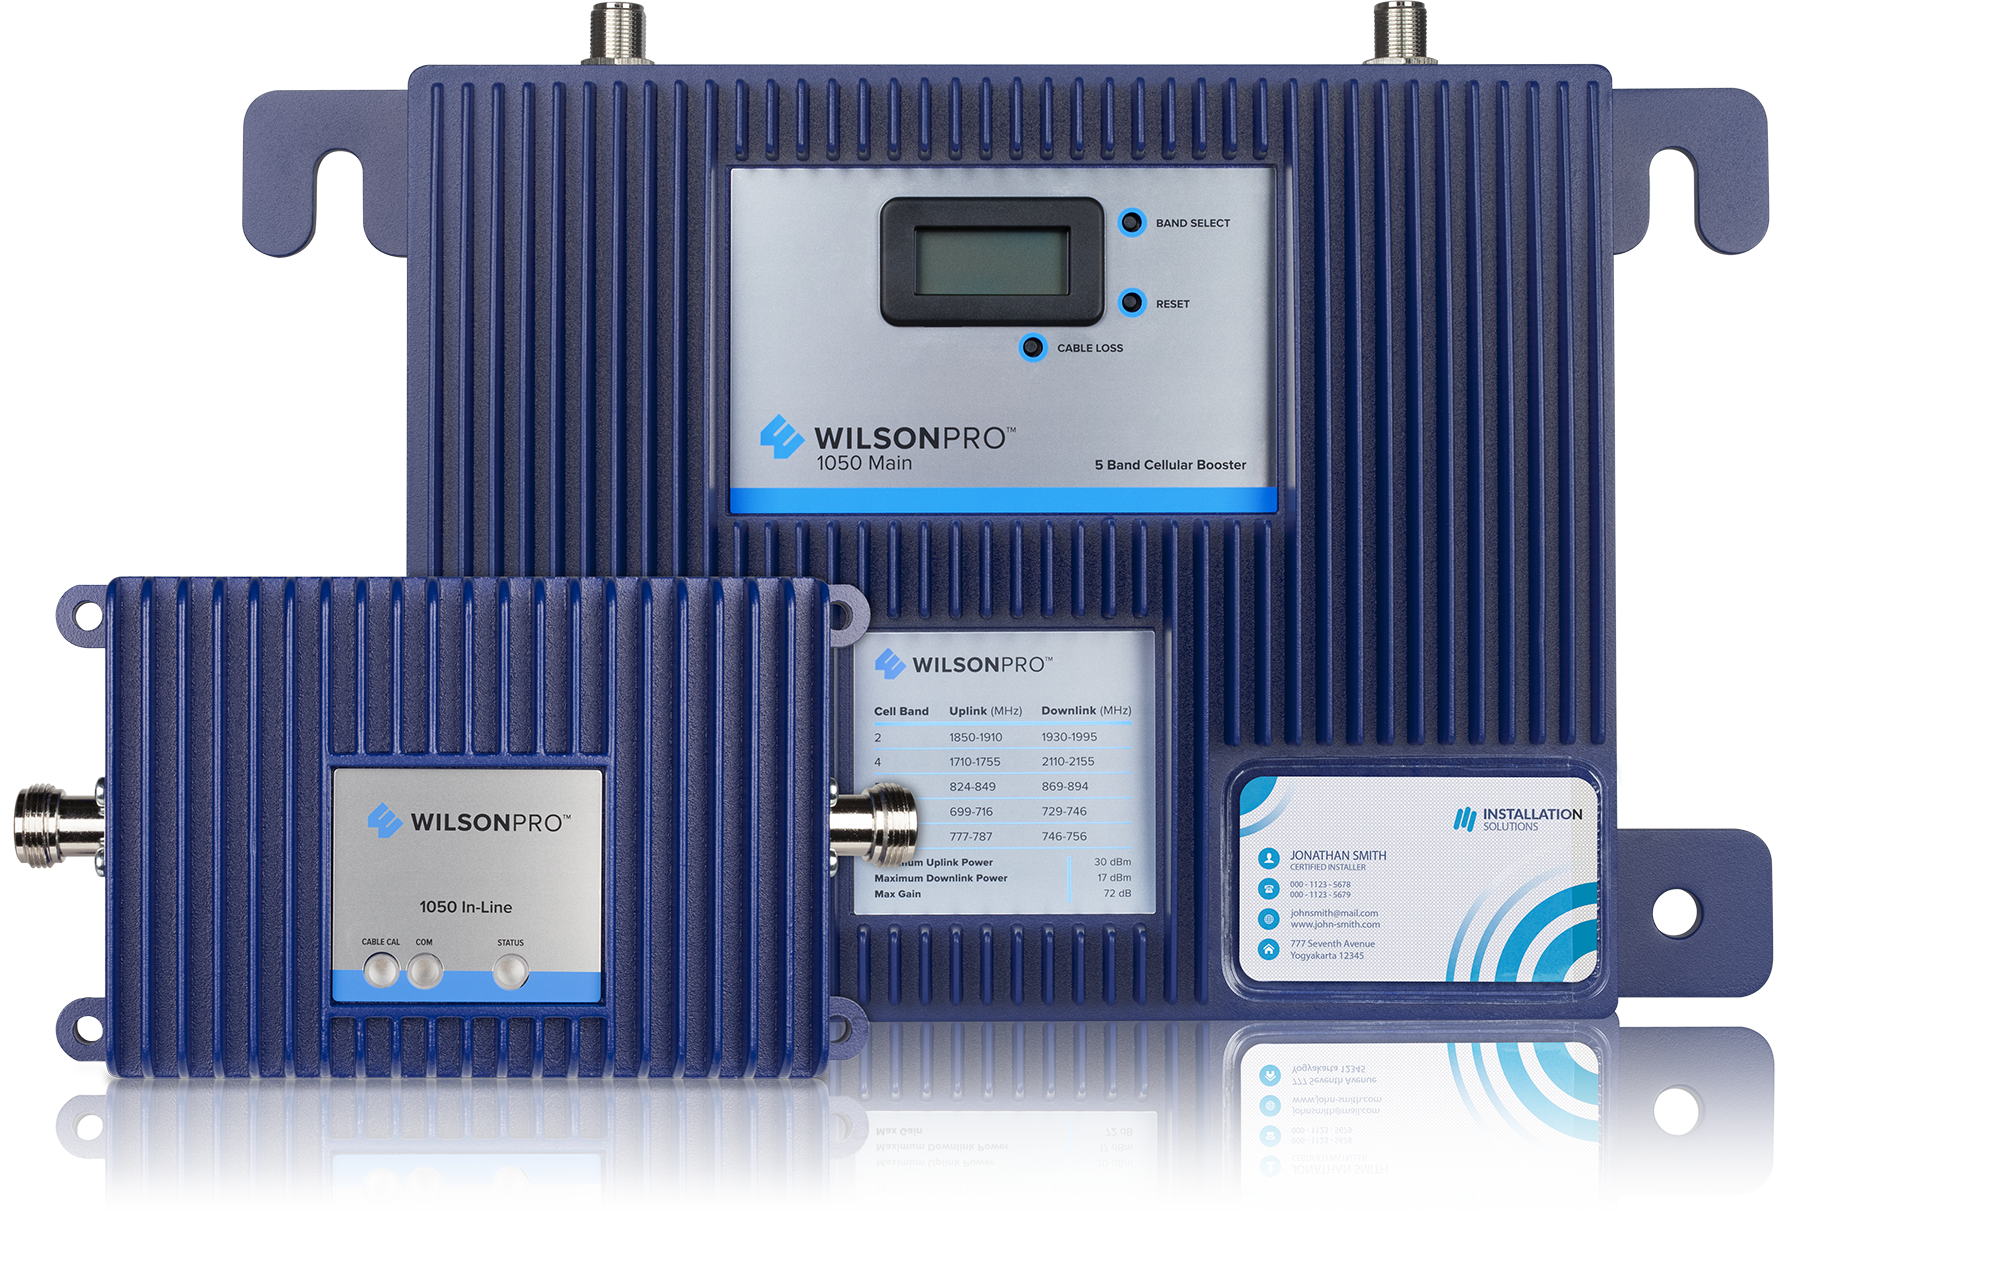 WilsonPro Pro1050